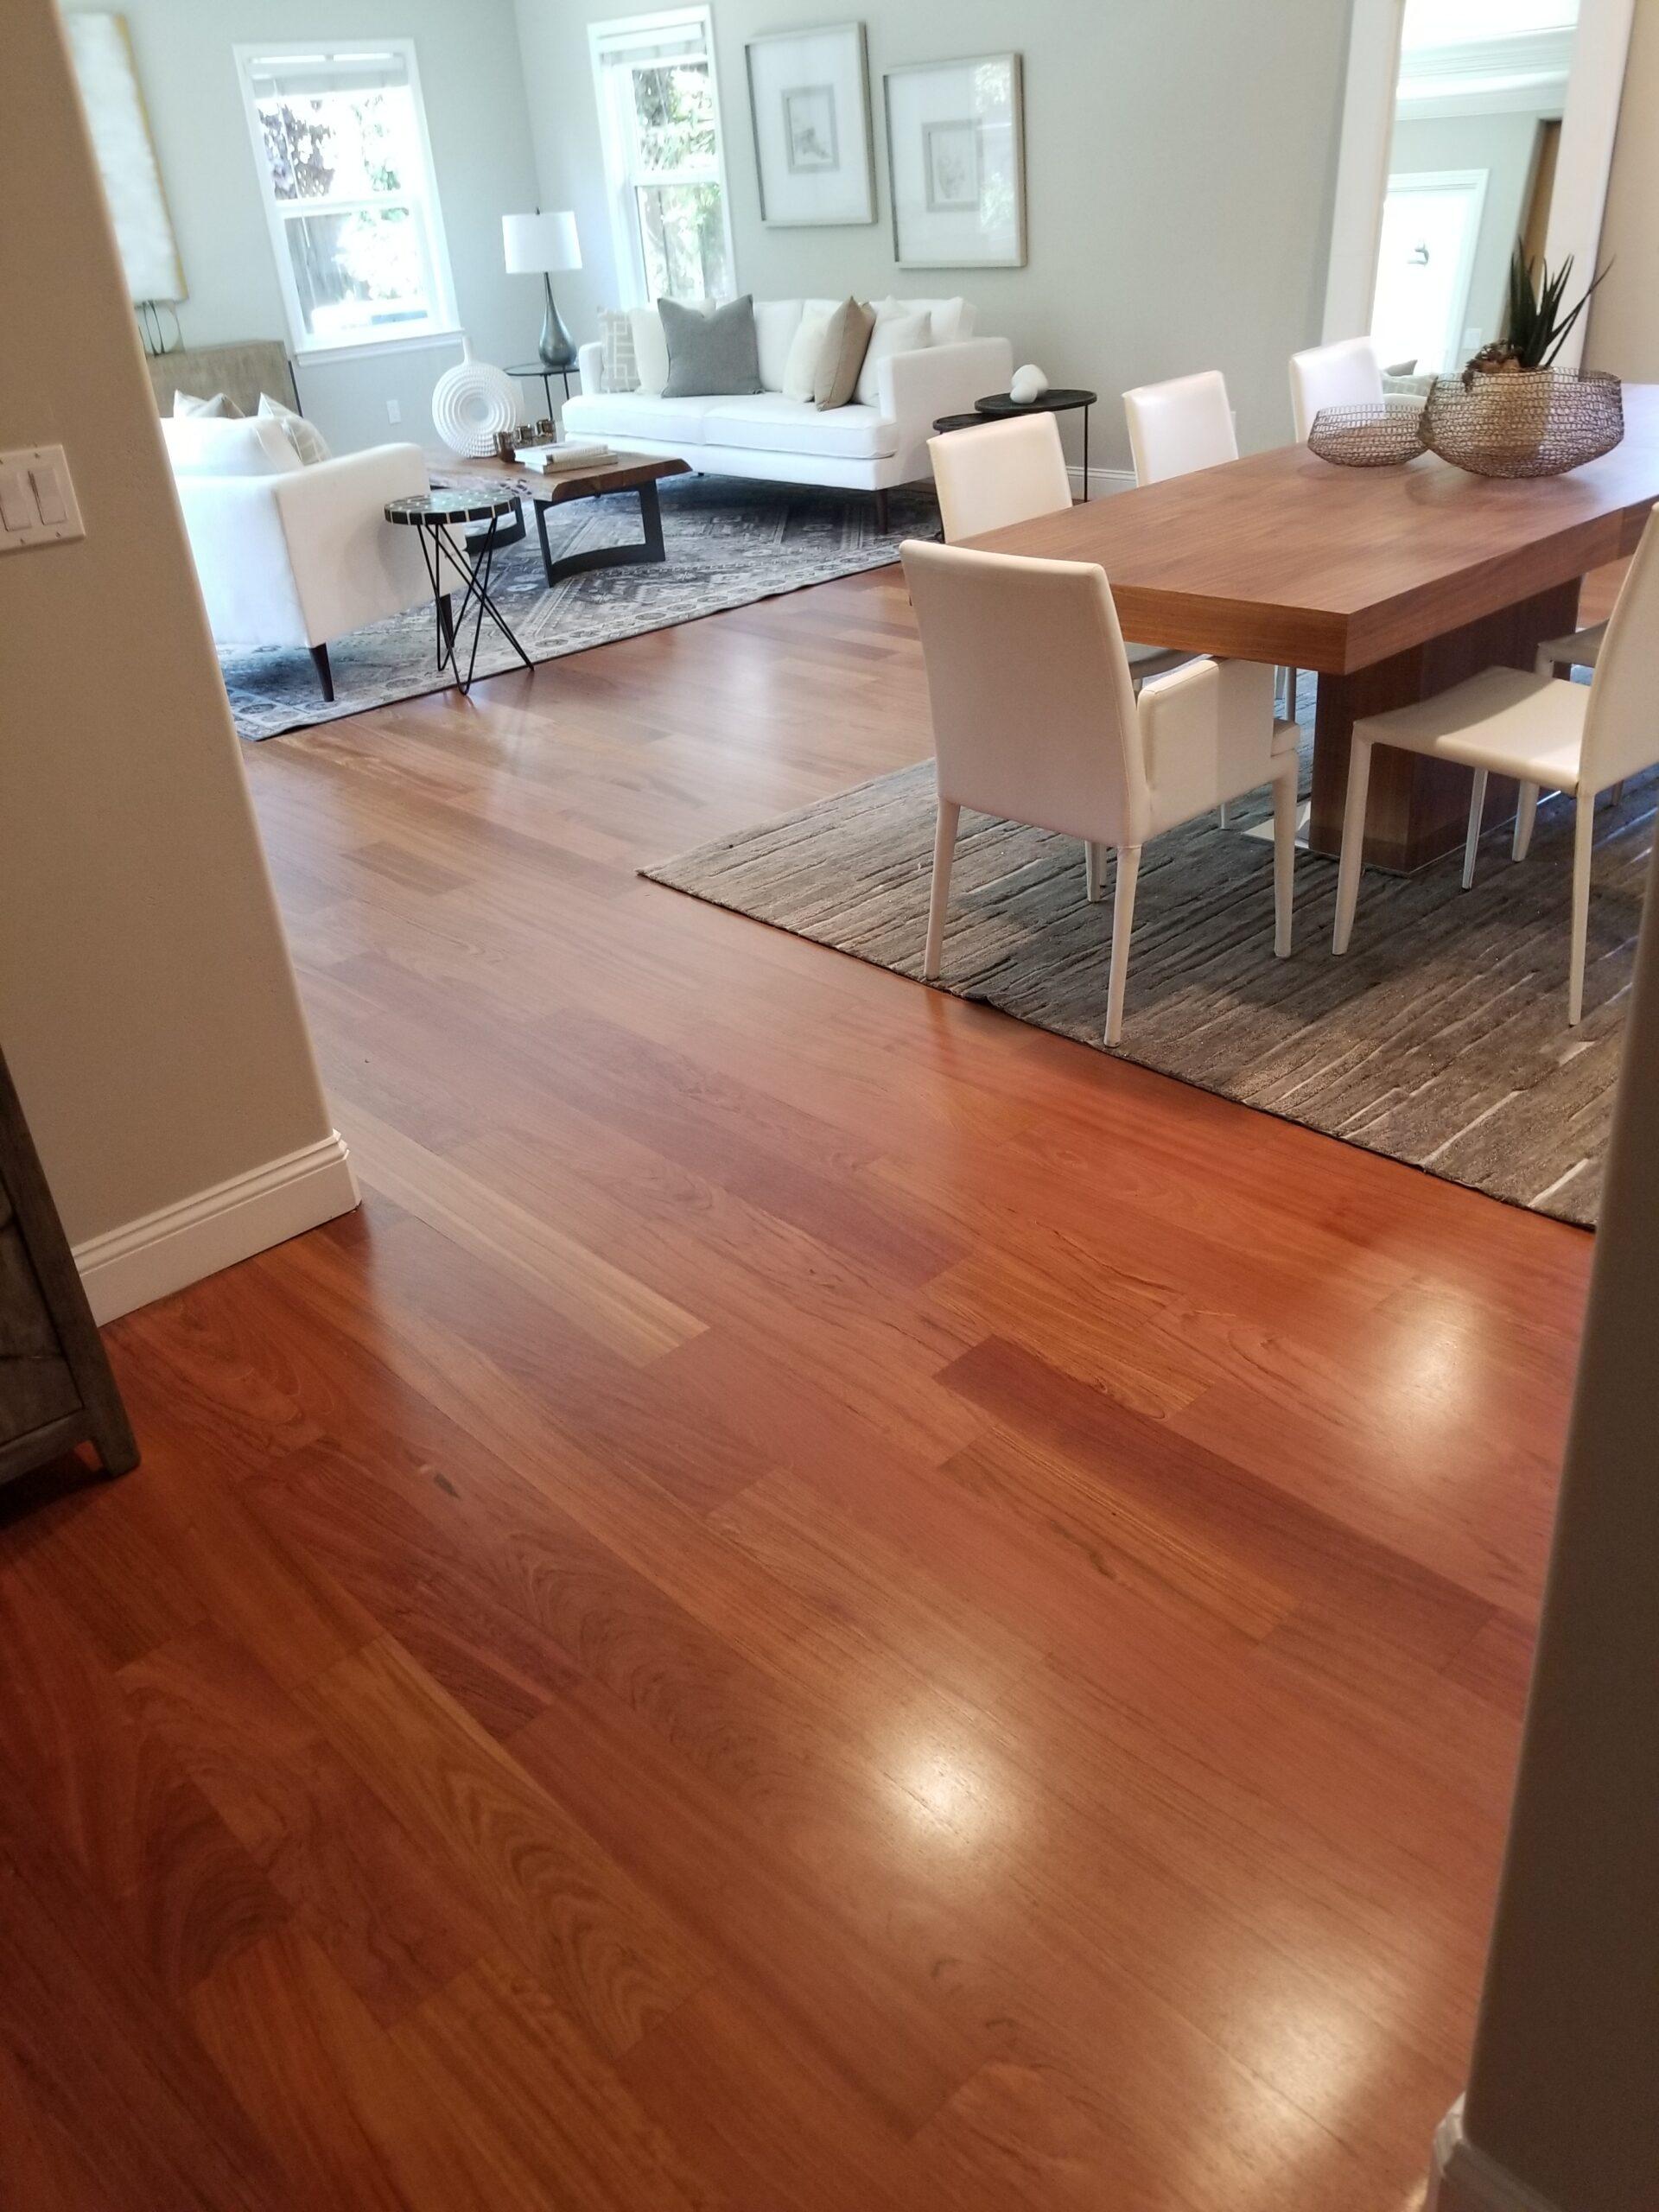 Sunnyal Residential: Refinish living room and hallways' Brazilian cherry hardwood.